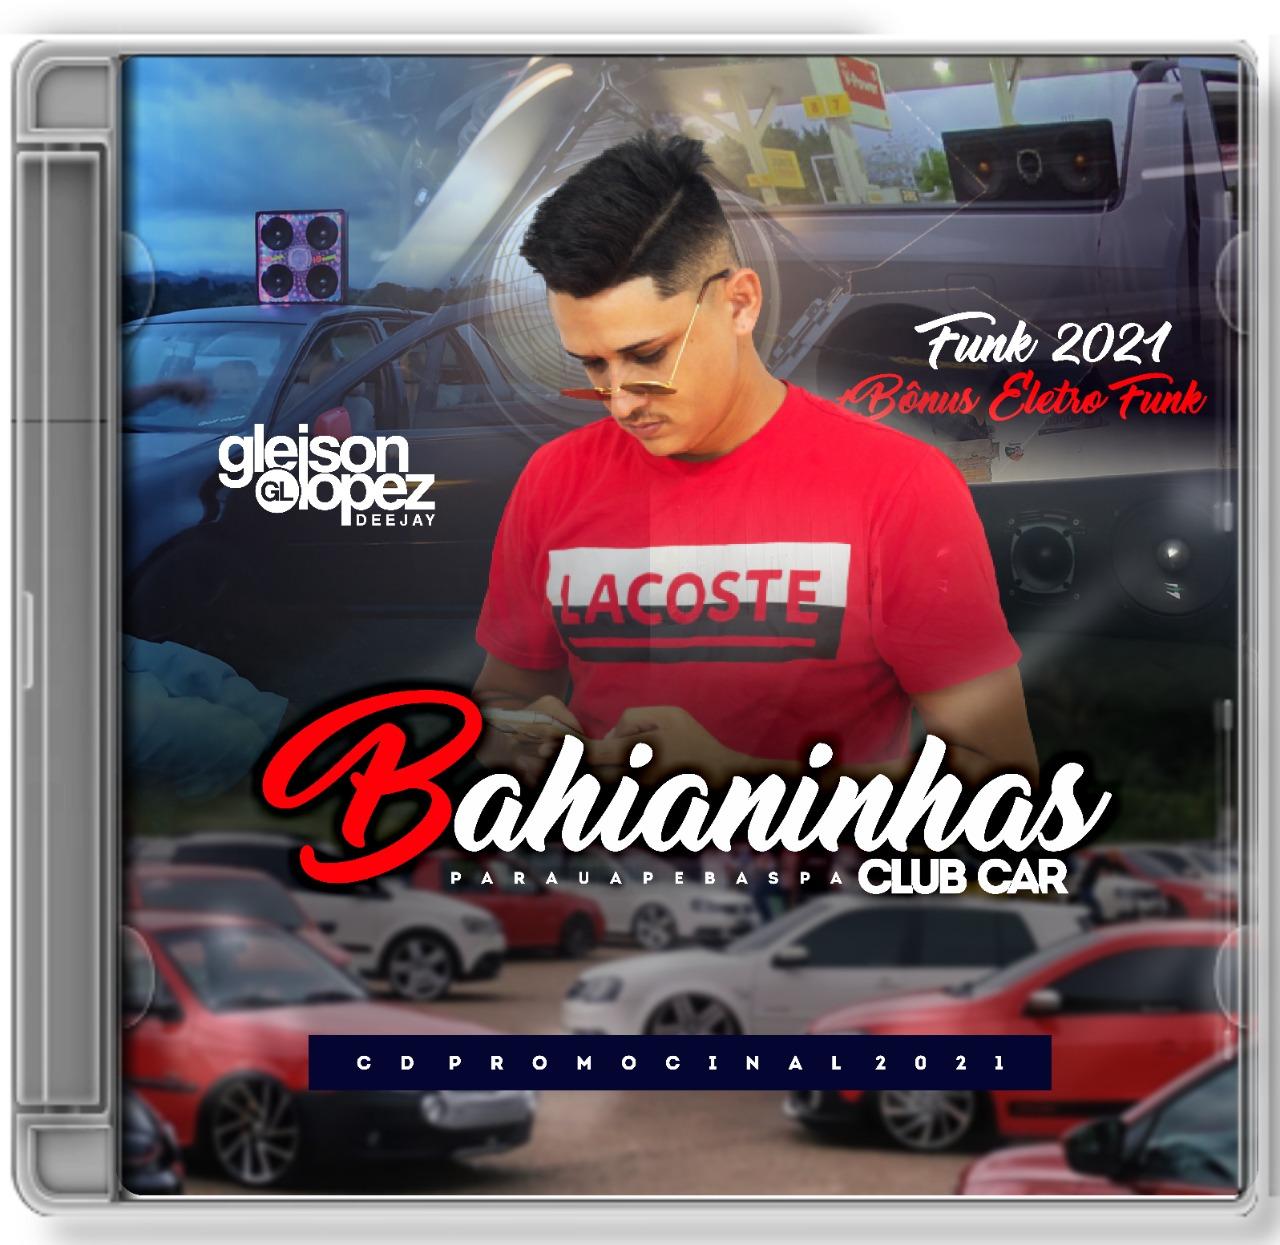 Bahianinhas Club Car - FUNK - Gleison Lopez